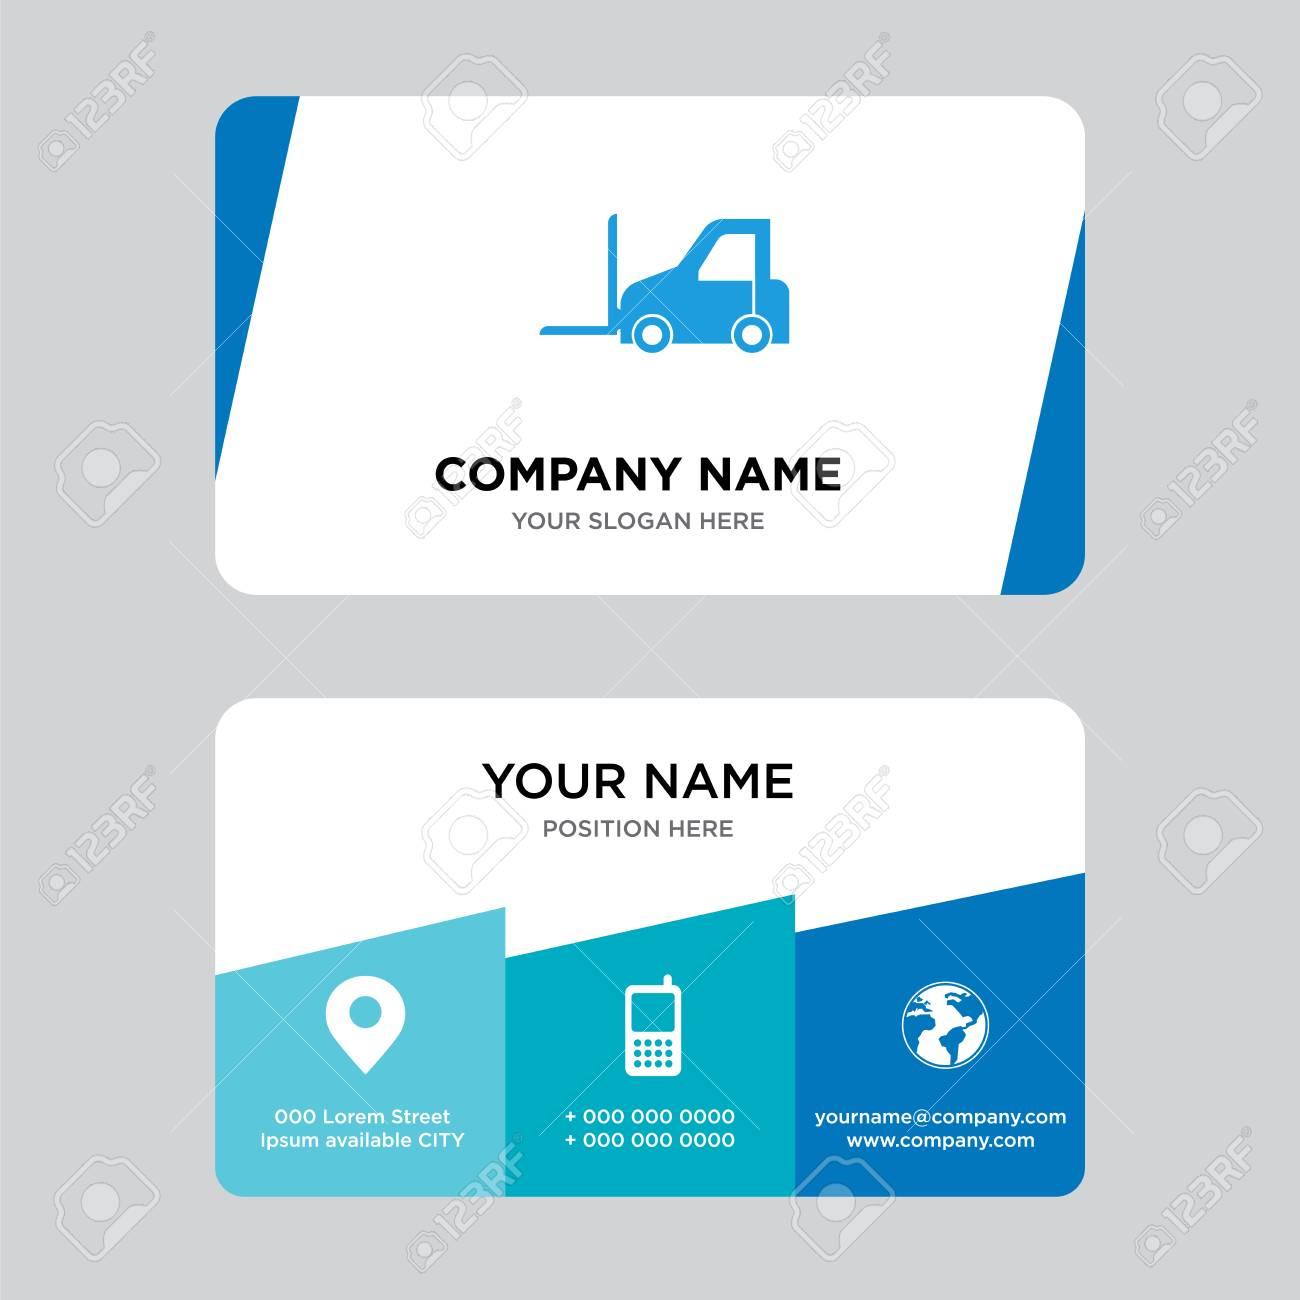 Logistics Transport Business Card Design Template Visiting For